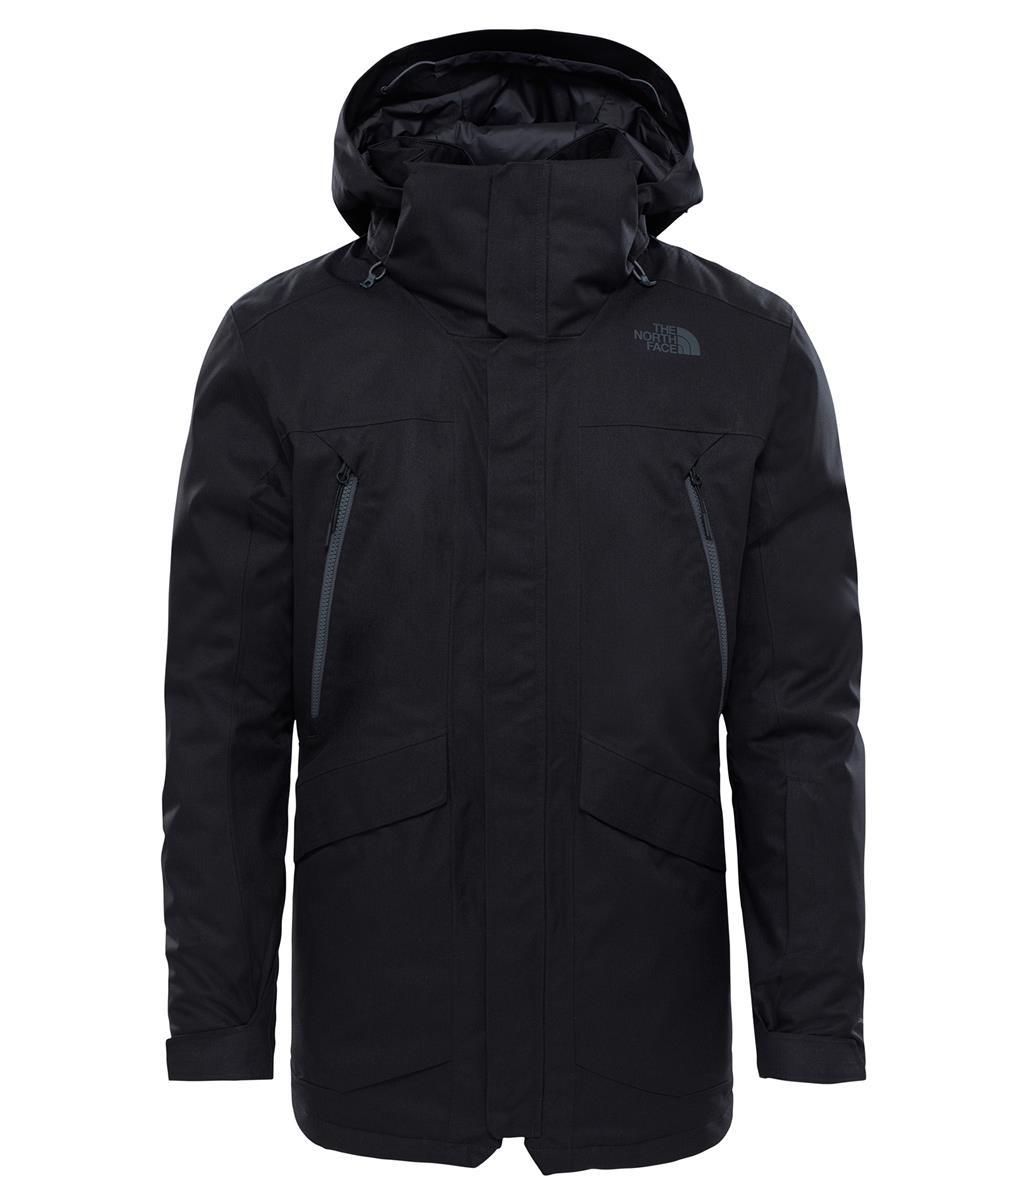 The North Face M Gatekeeper Jacket